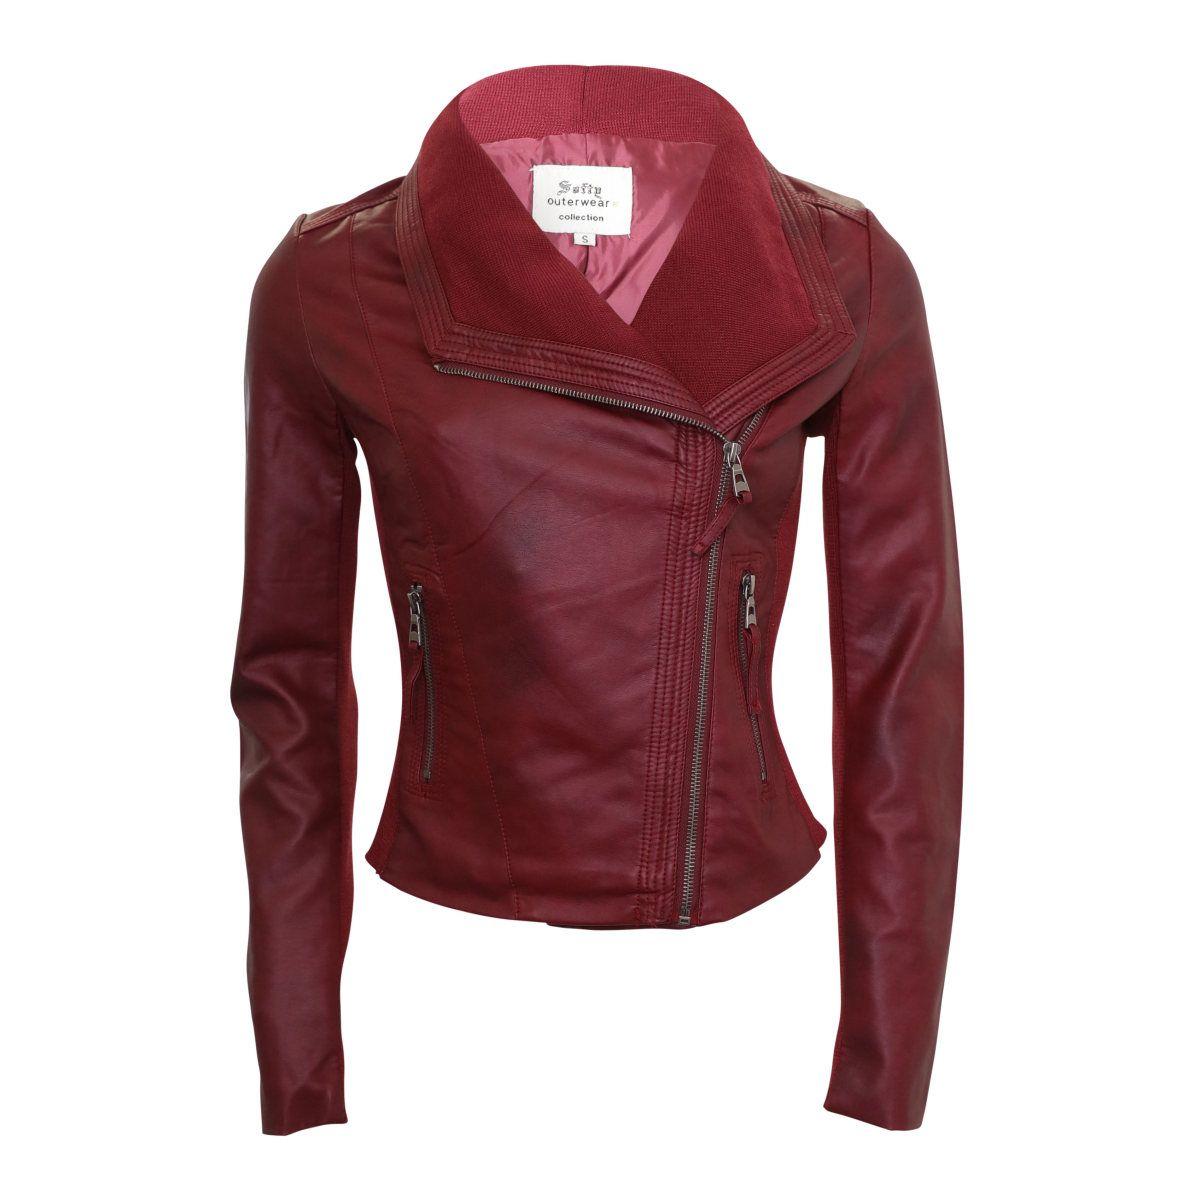 My Softy Side Zip Pu Jacket Burgundy Coats Jackets Women Womens Fashion Jackets Jackets [ 1200 x 1200 Pixel ]